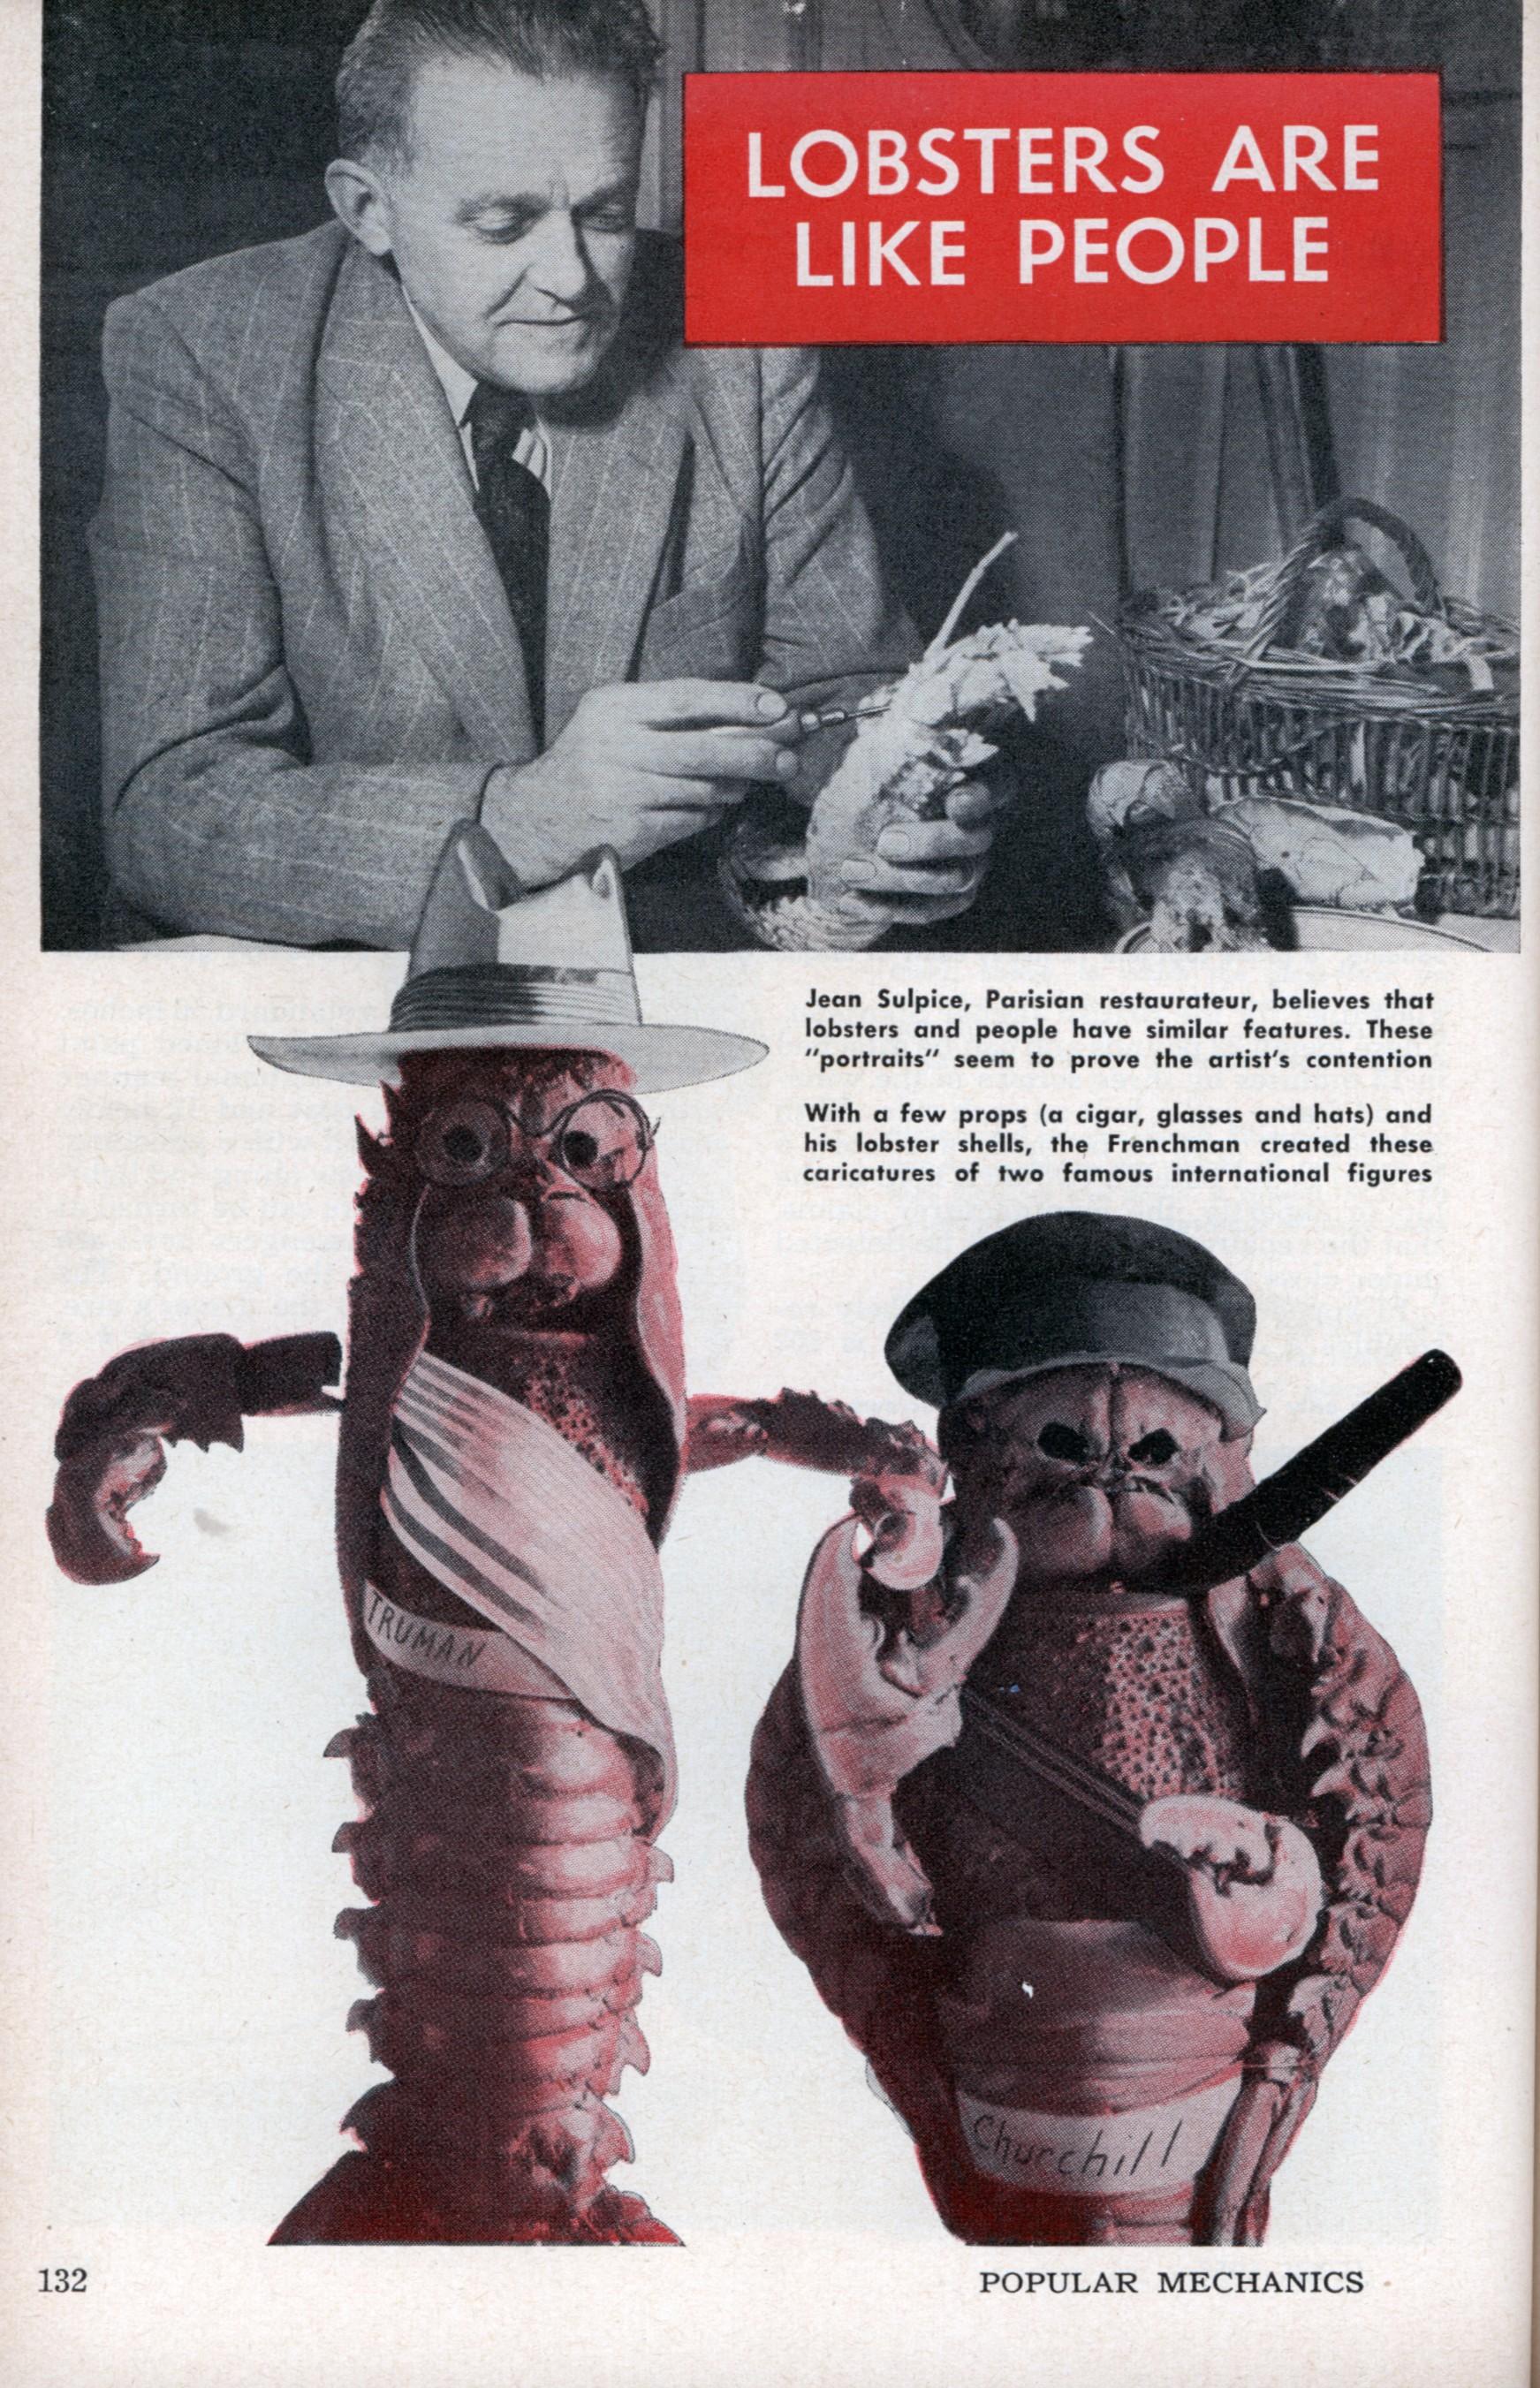 https://i0.wp.com/blog.modernmechanix.com/mags/PopularMechanics/6-1952/lobster_people/lobster_people_0.jpg